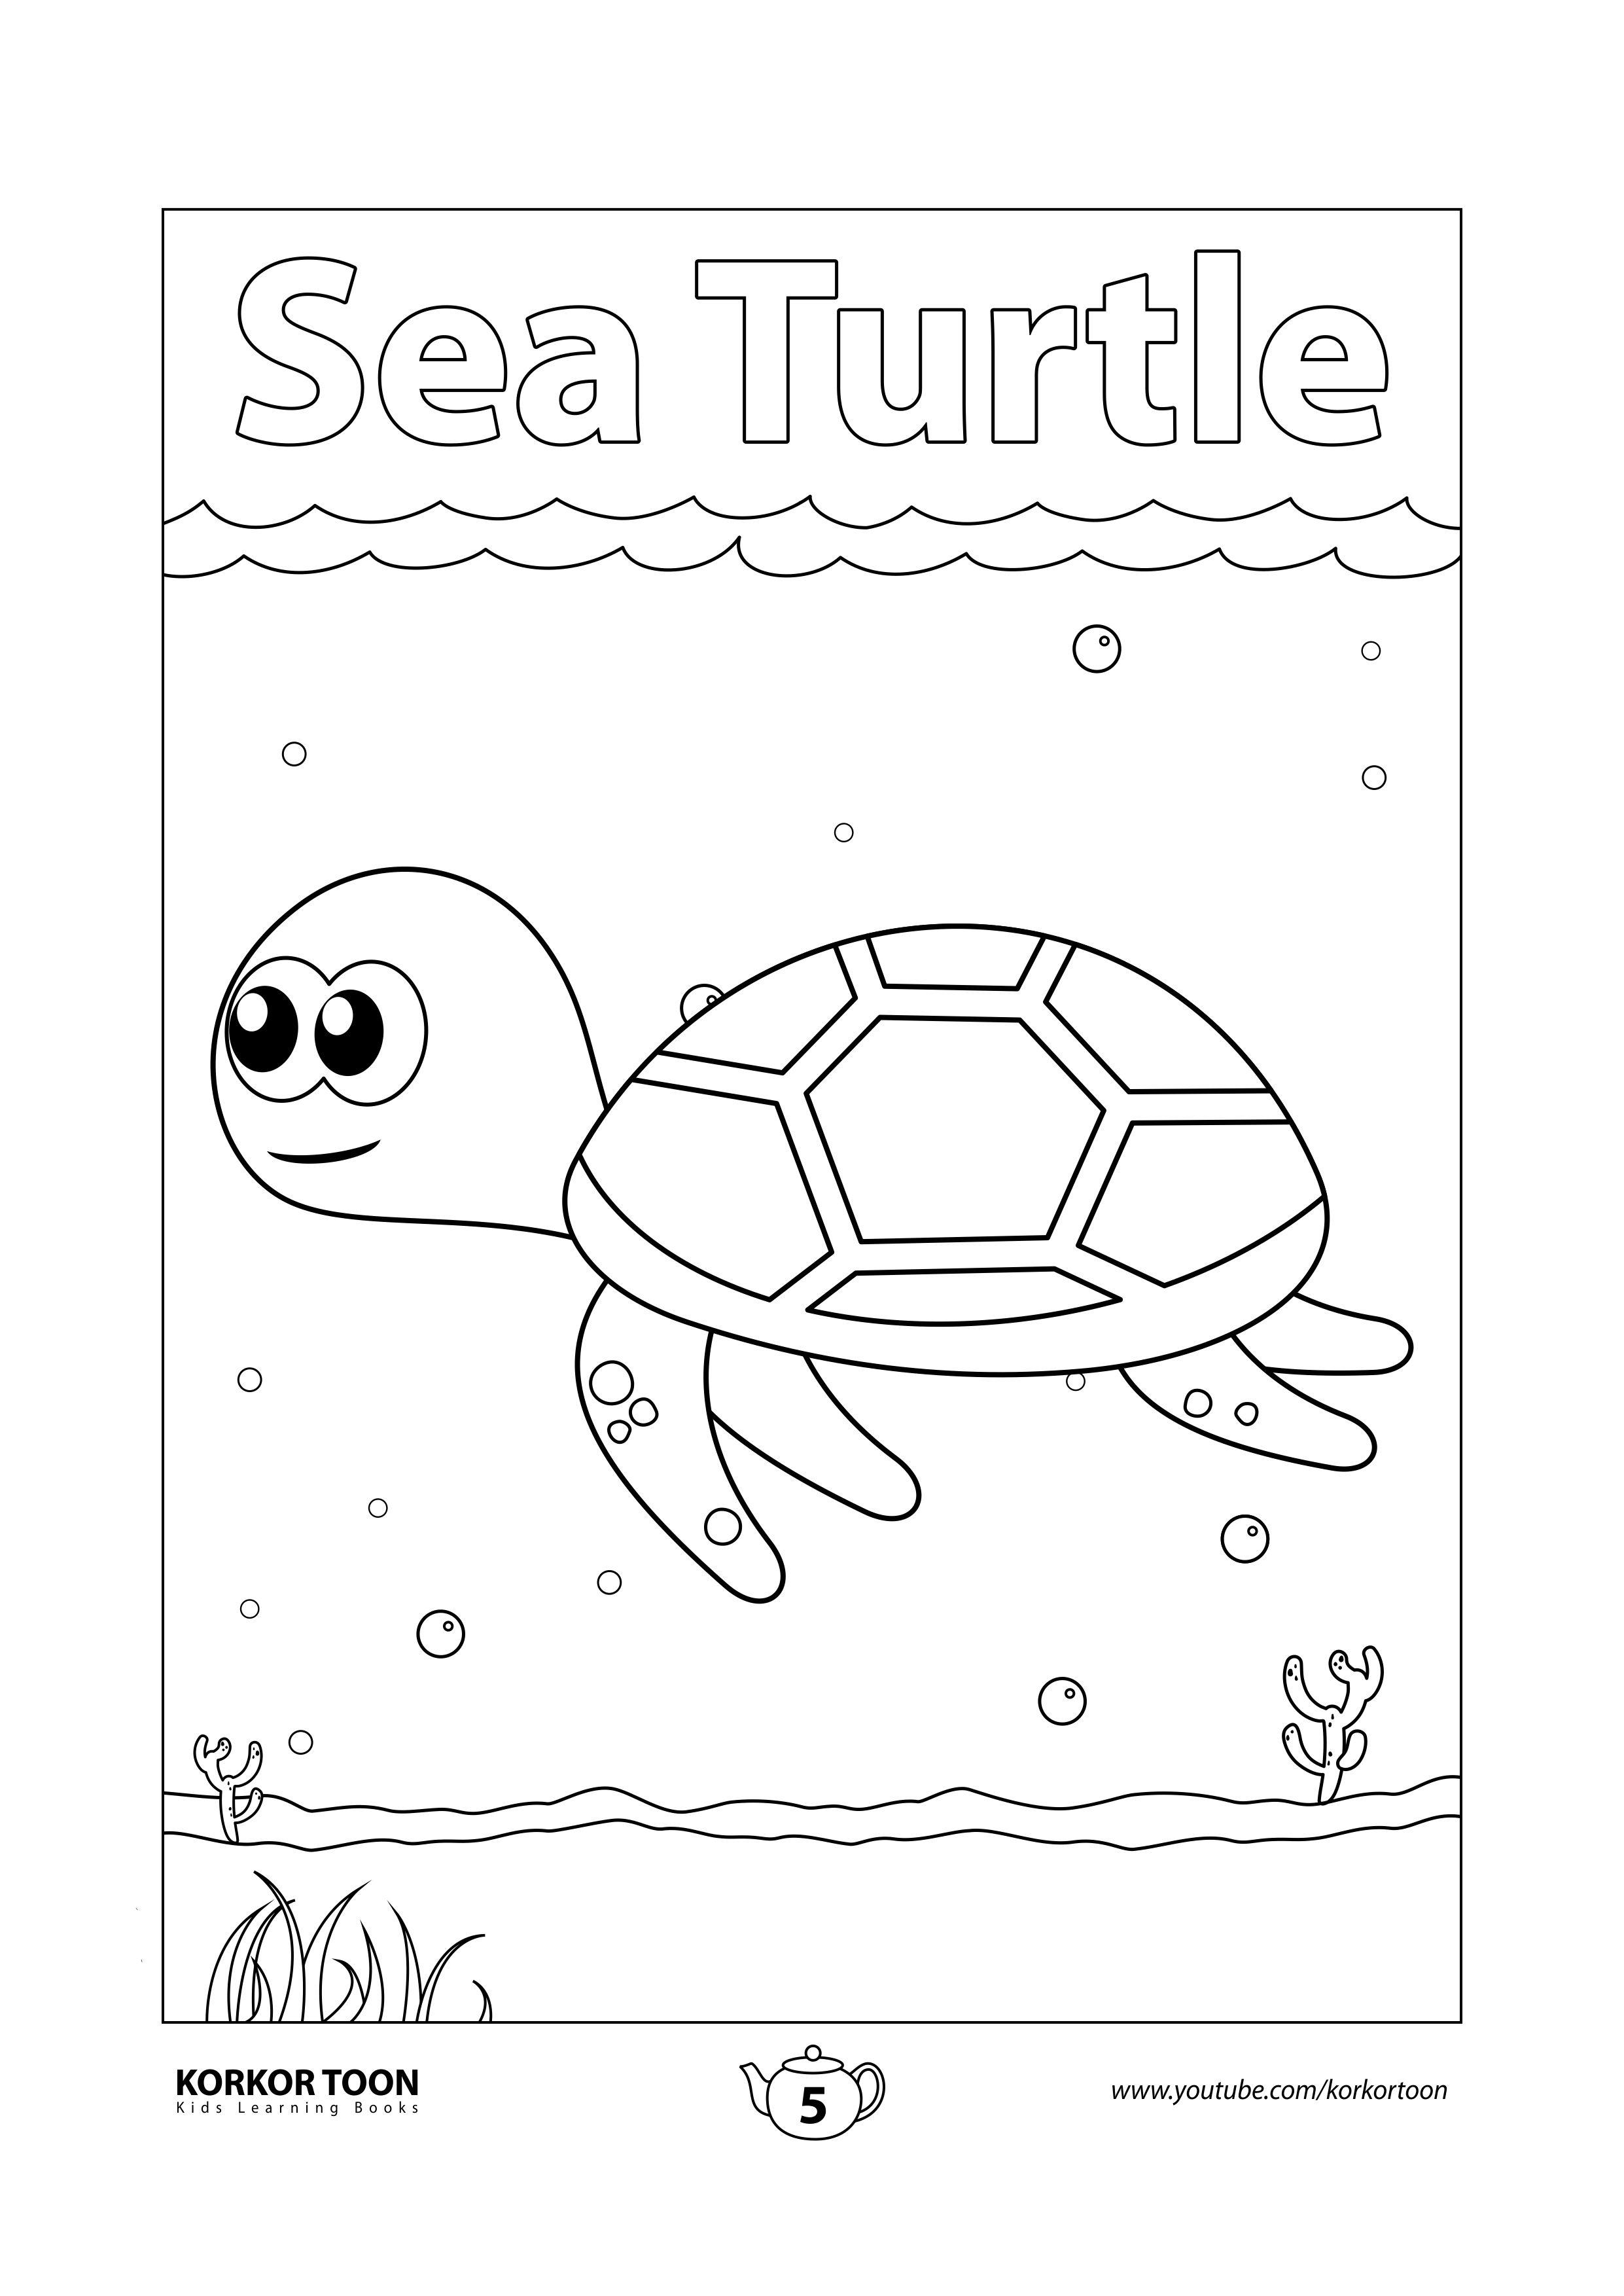 Sea Turtle Coloring Page Sea Animals Coloring Book For Kids Coloring Books Turtle Coloring Pages Animal Coloring Books